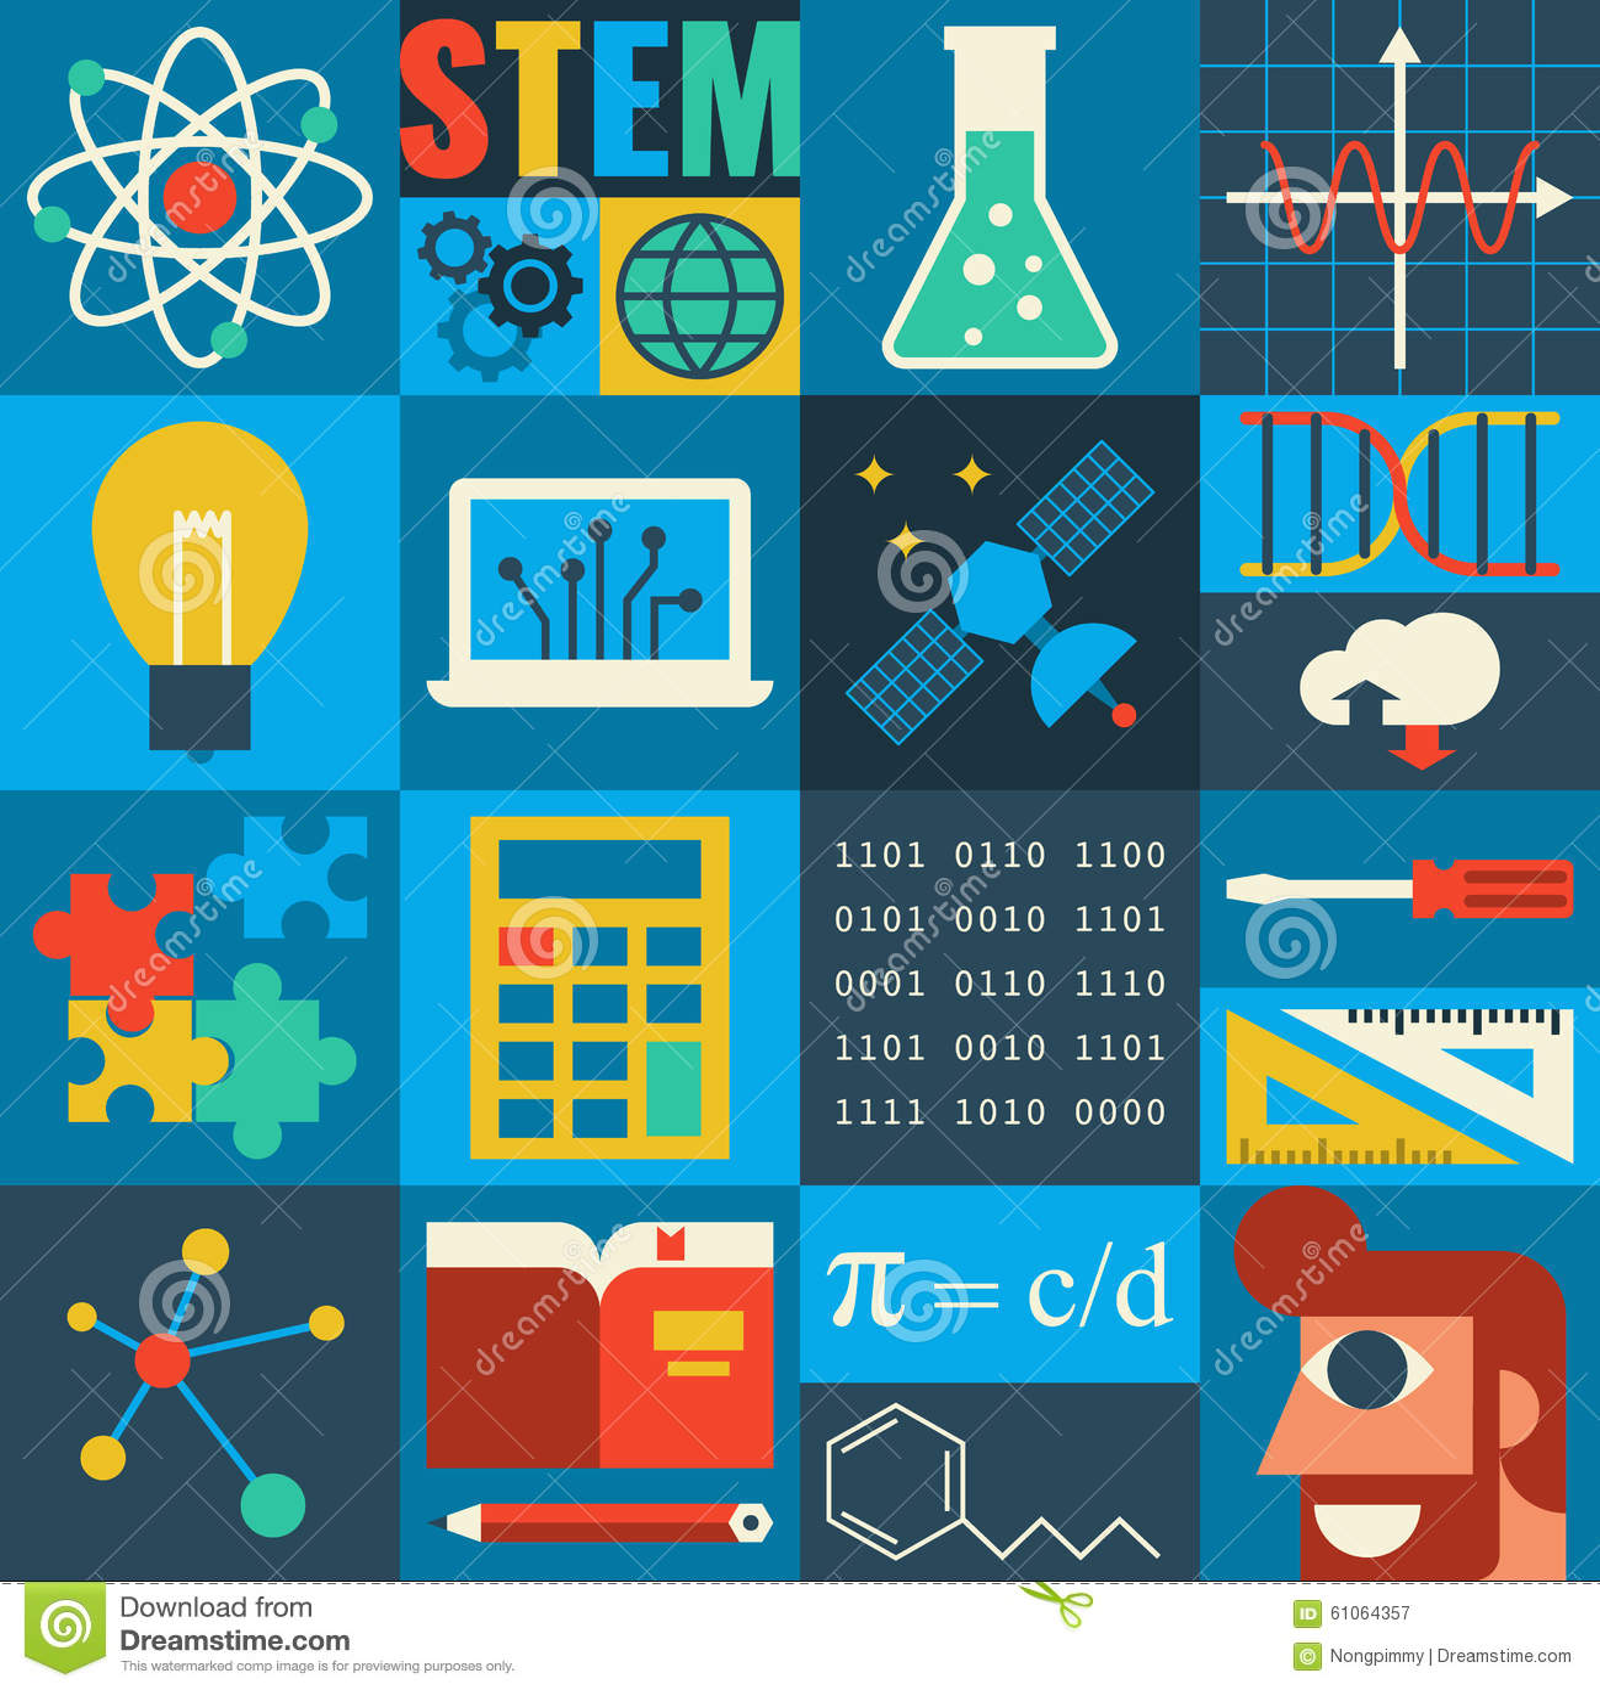 Stem Education: STEM Education Stock Vector